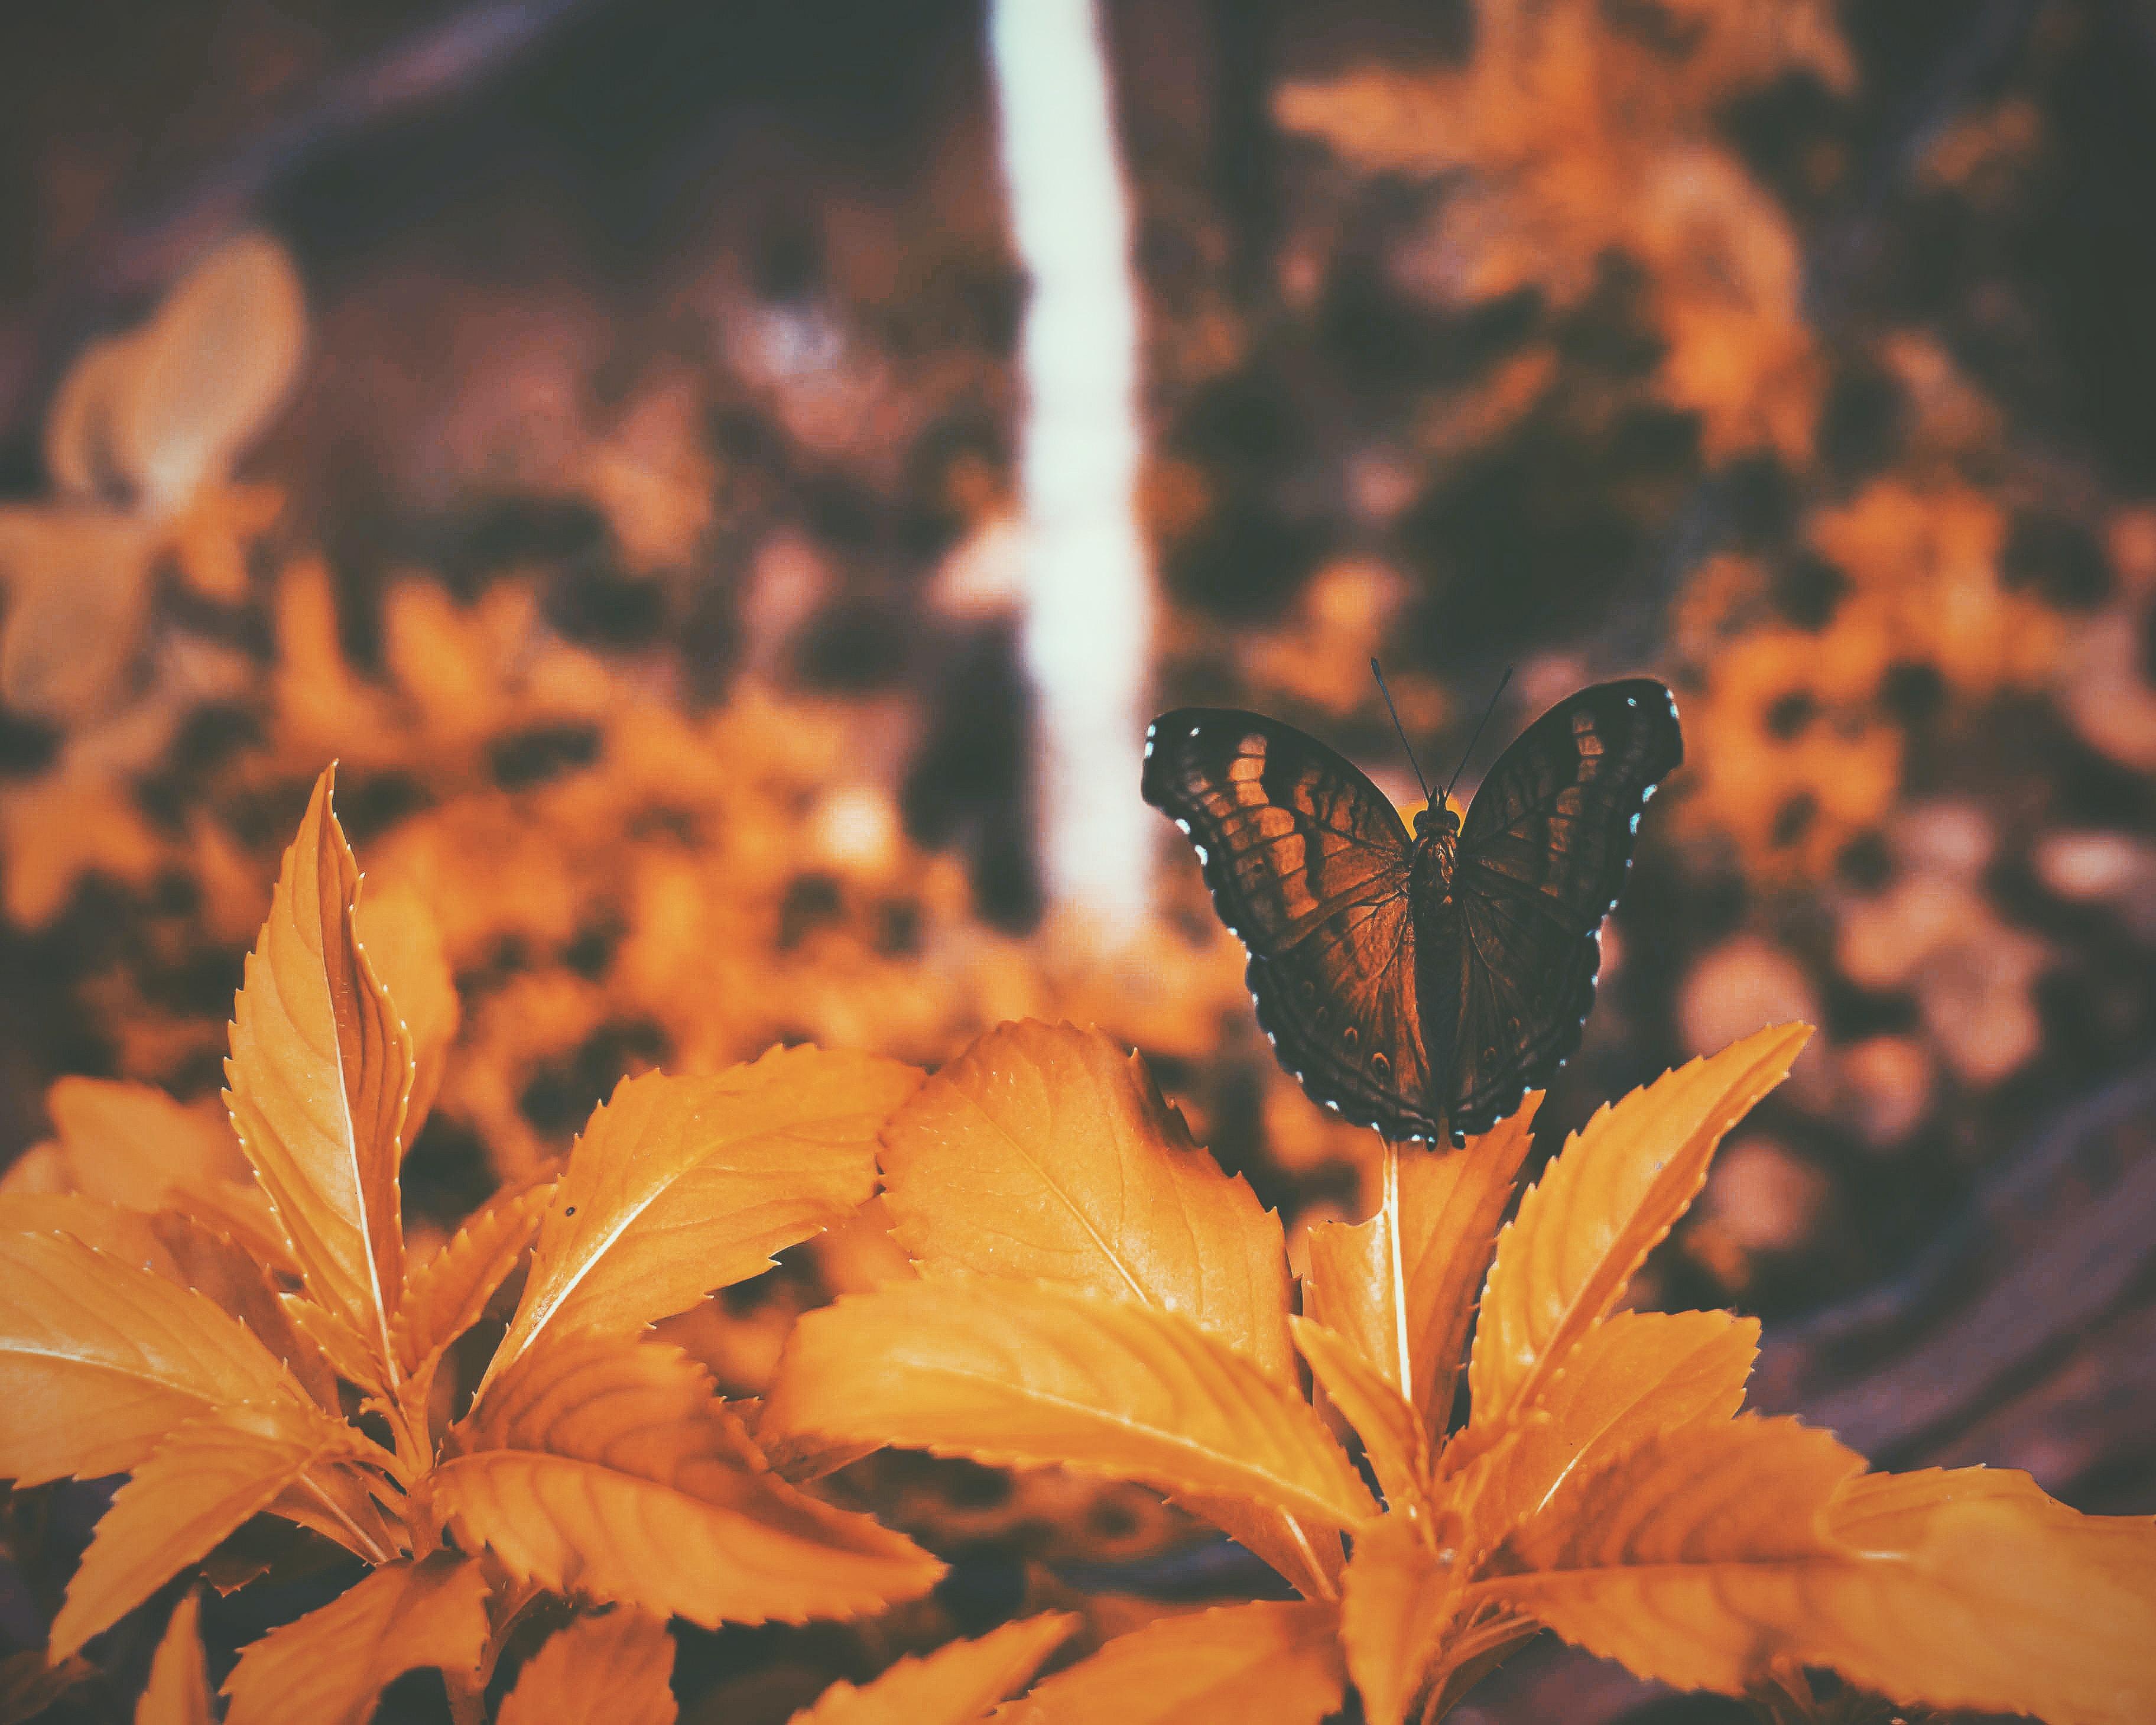 black butterfly perching on orange leaves